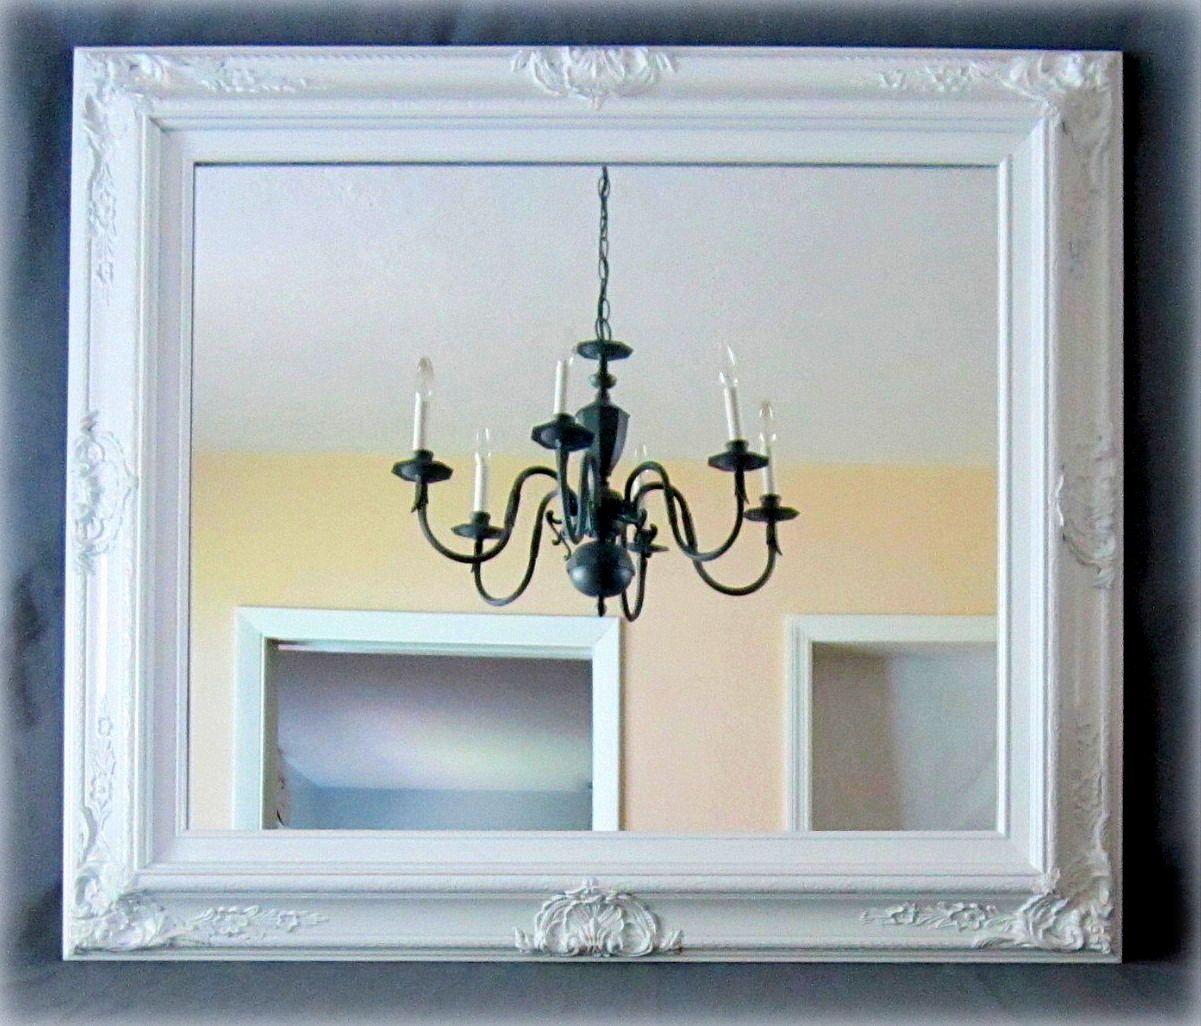 WHITE FRAMED MIRROR For Sale Regency Decor Unique Vanity